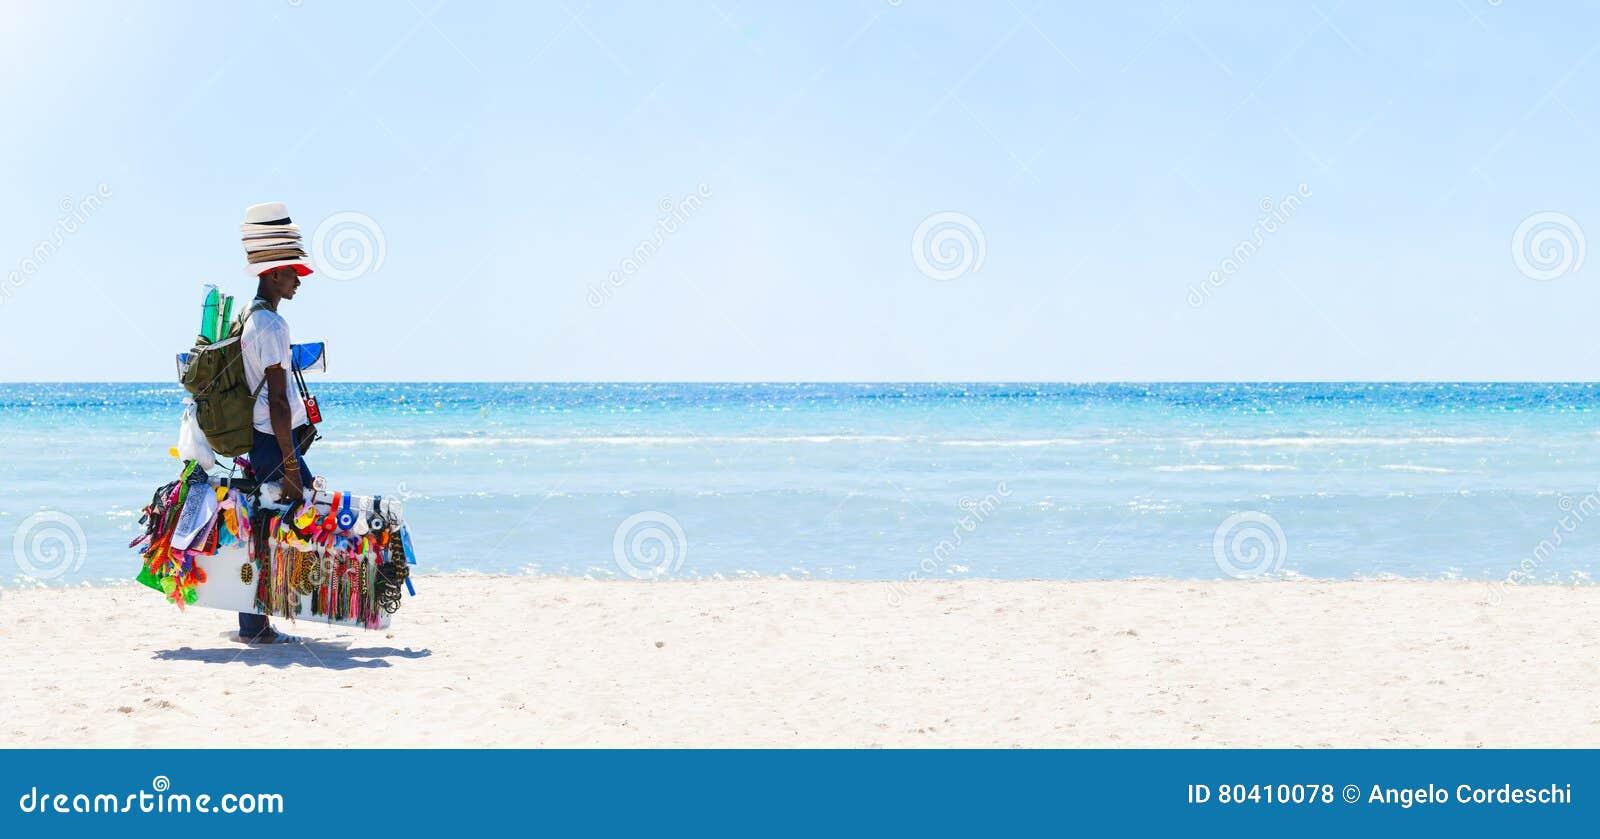 Peddler at the beach. Sea panorama